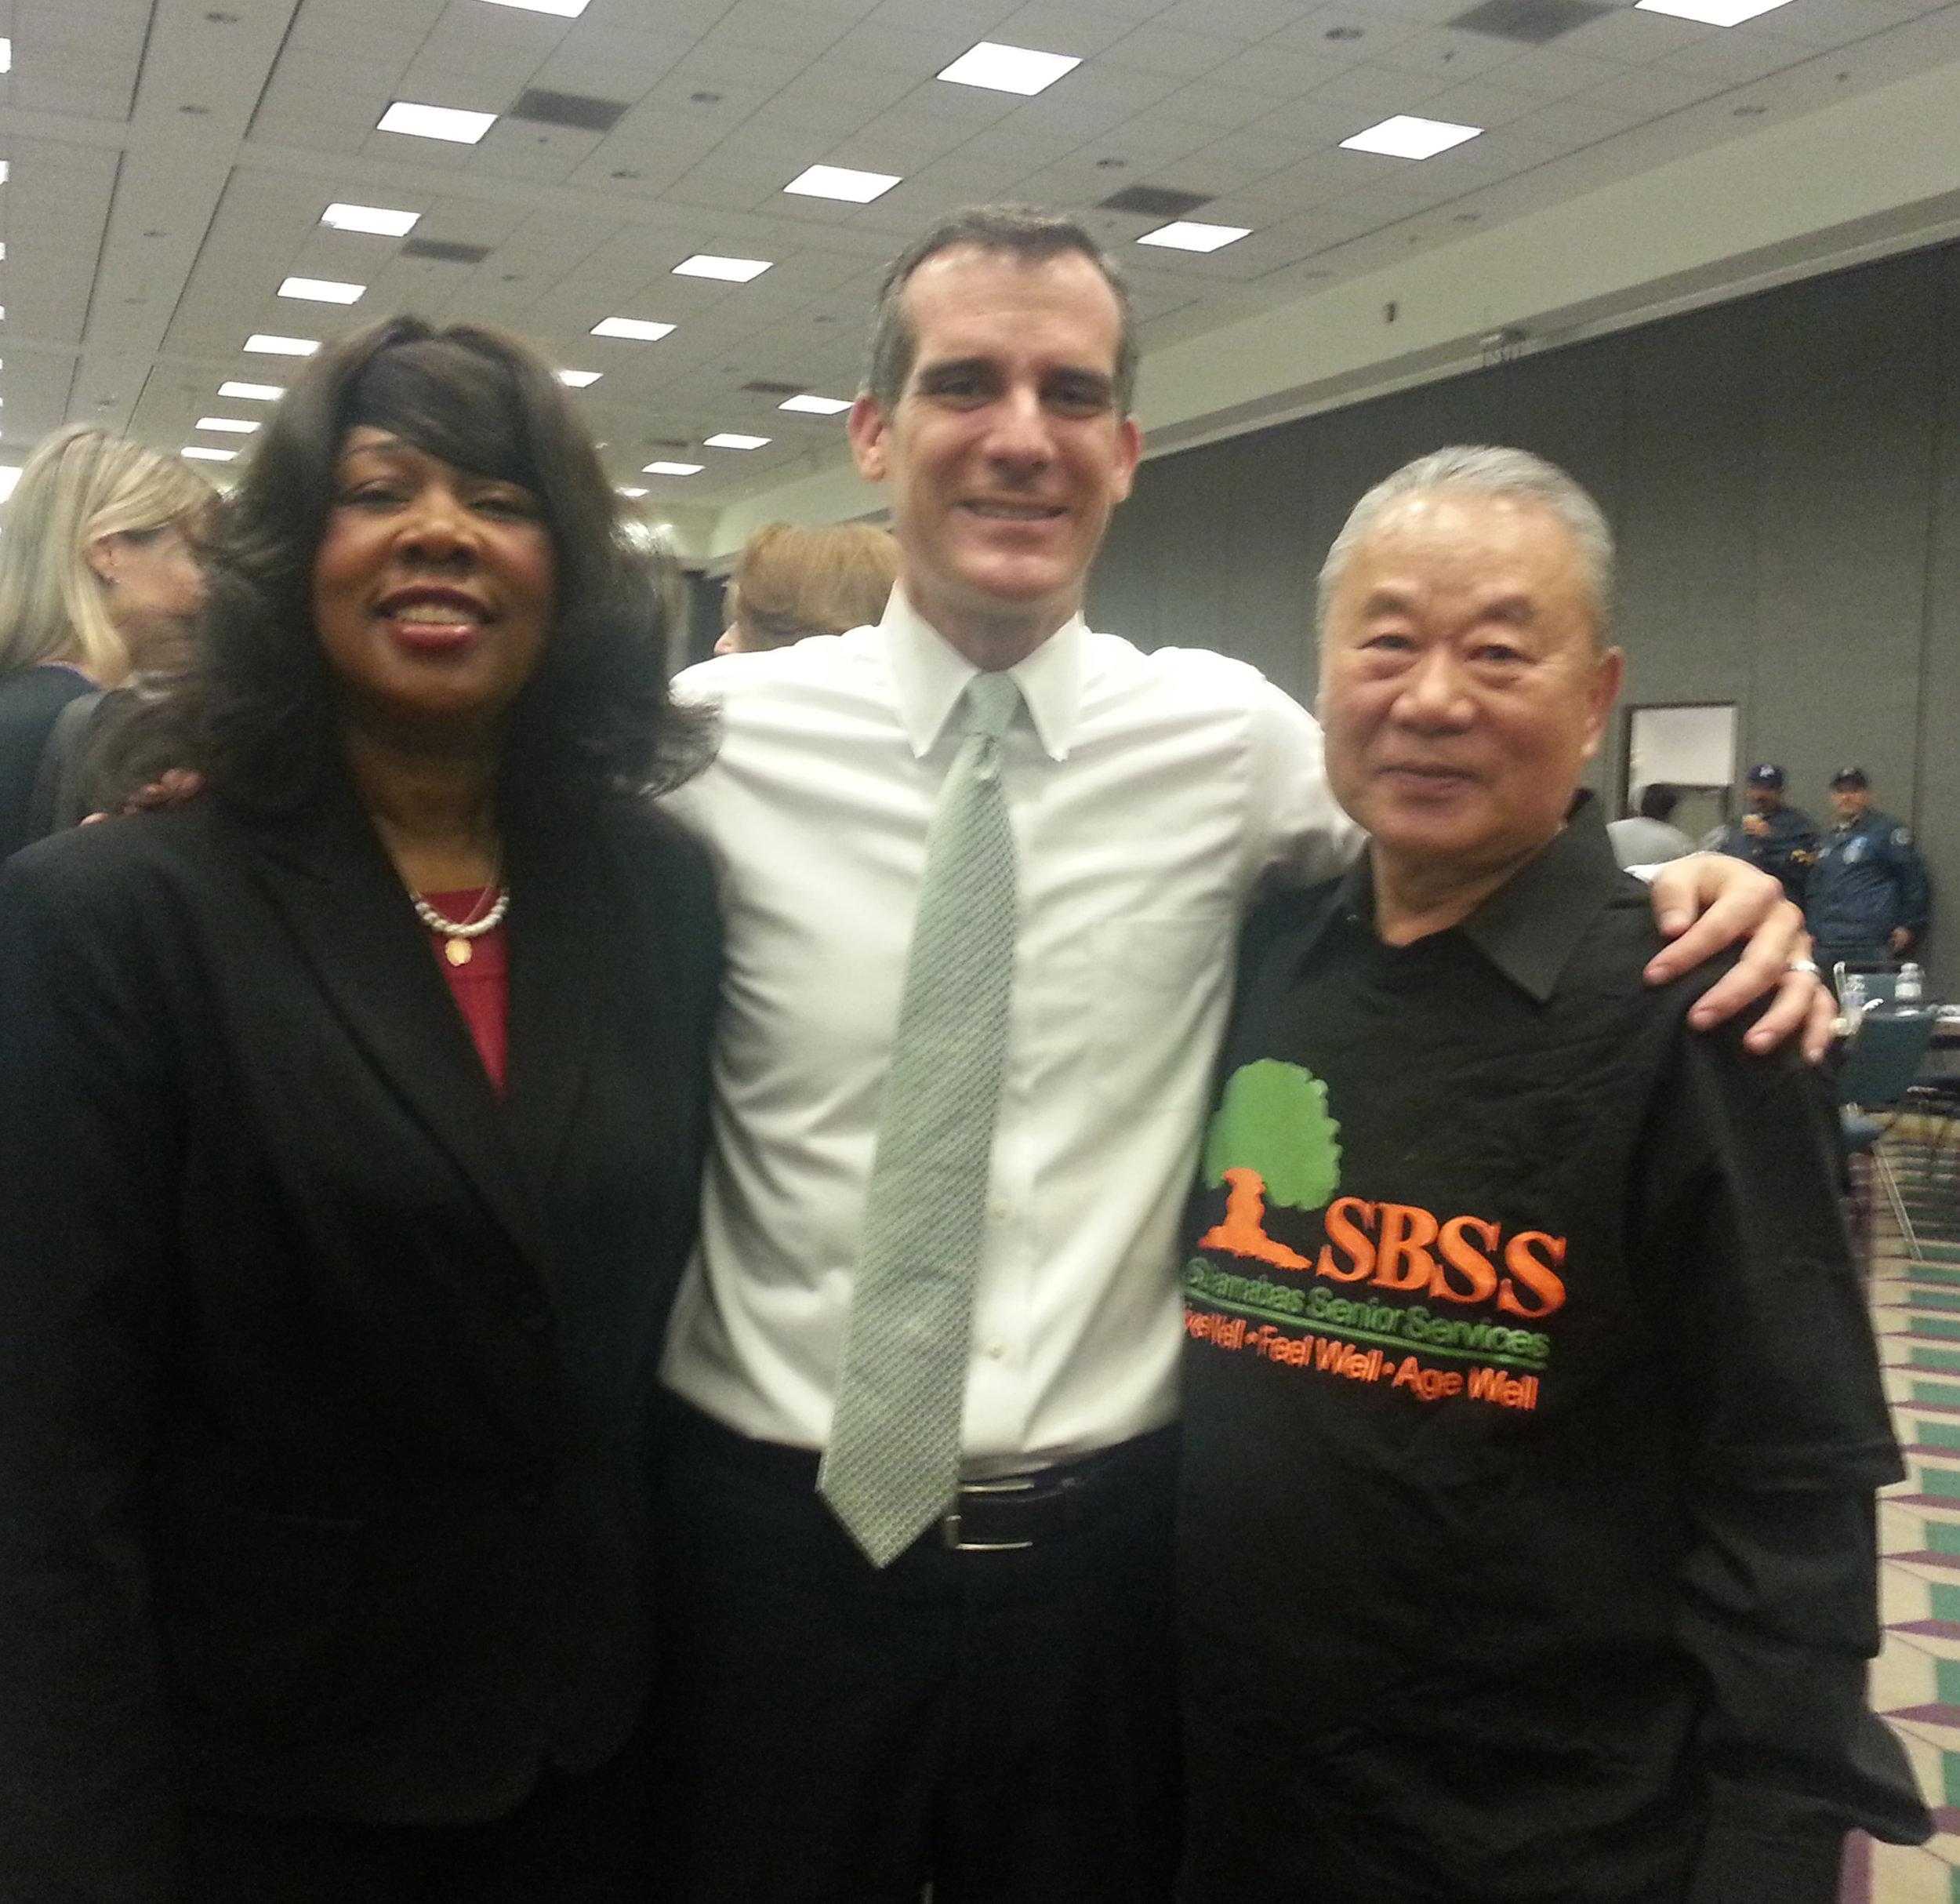 Mayor Eric Garcetti with AGEnts for Change